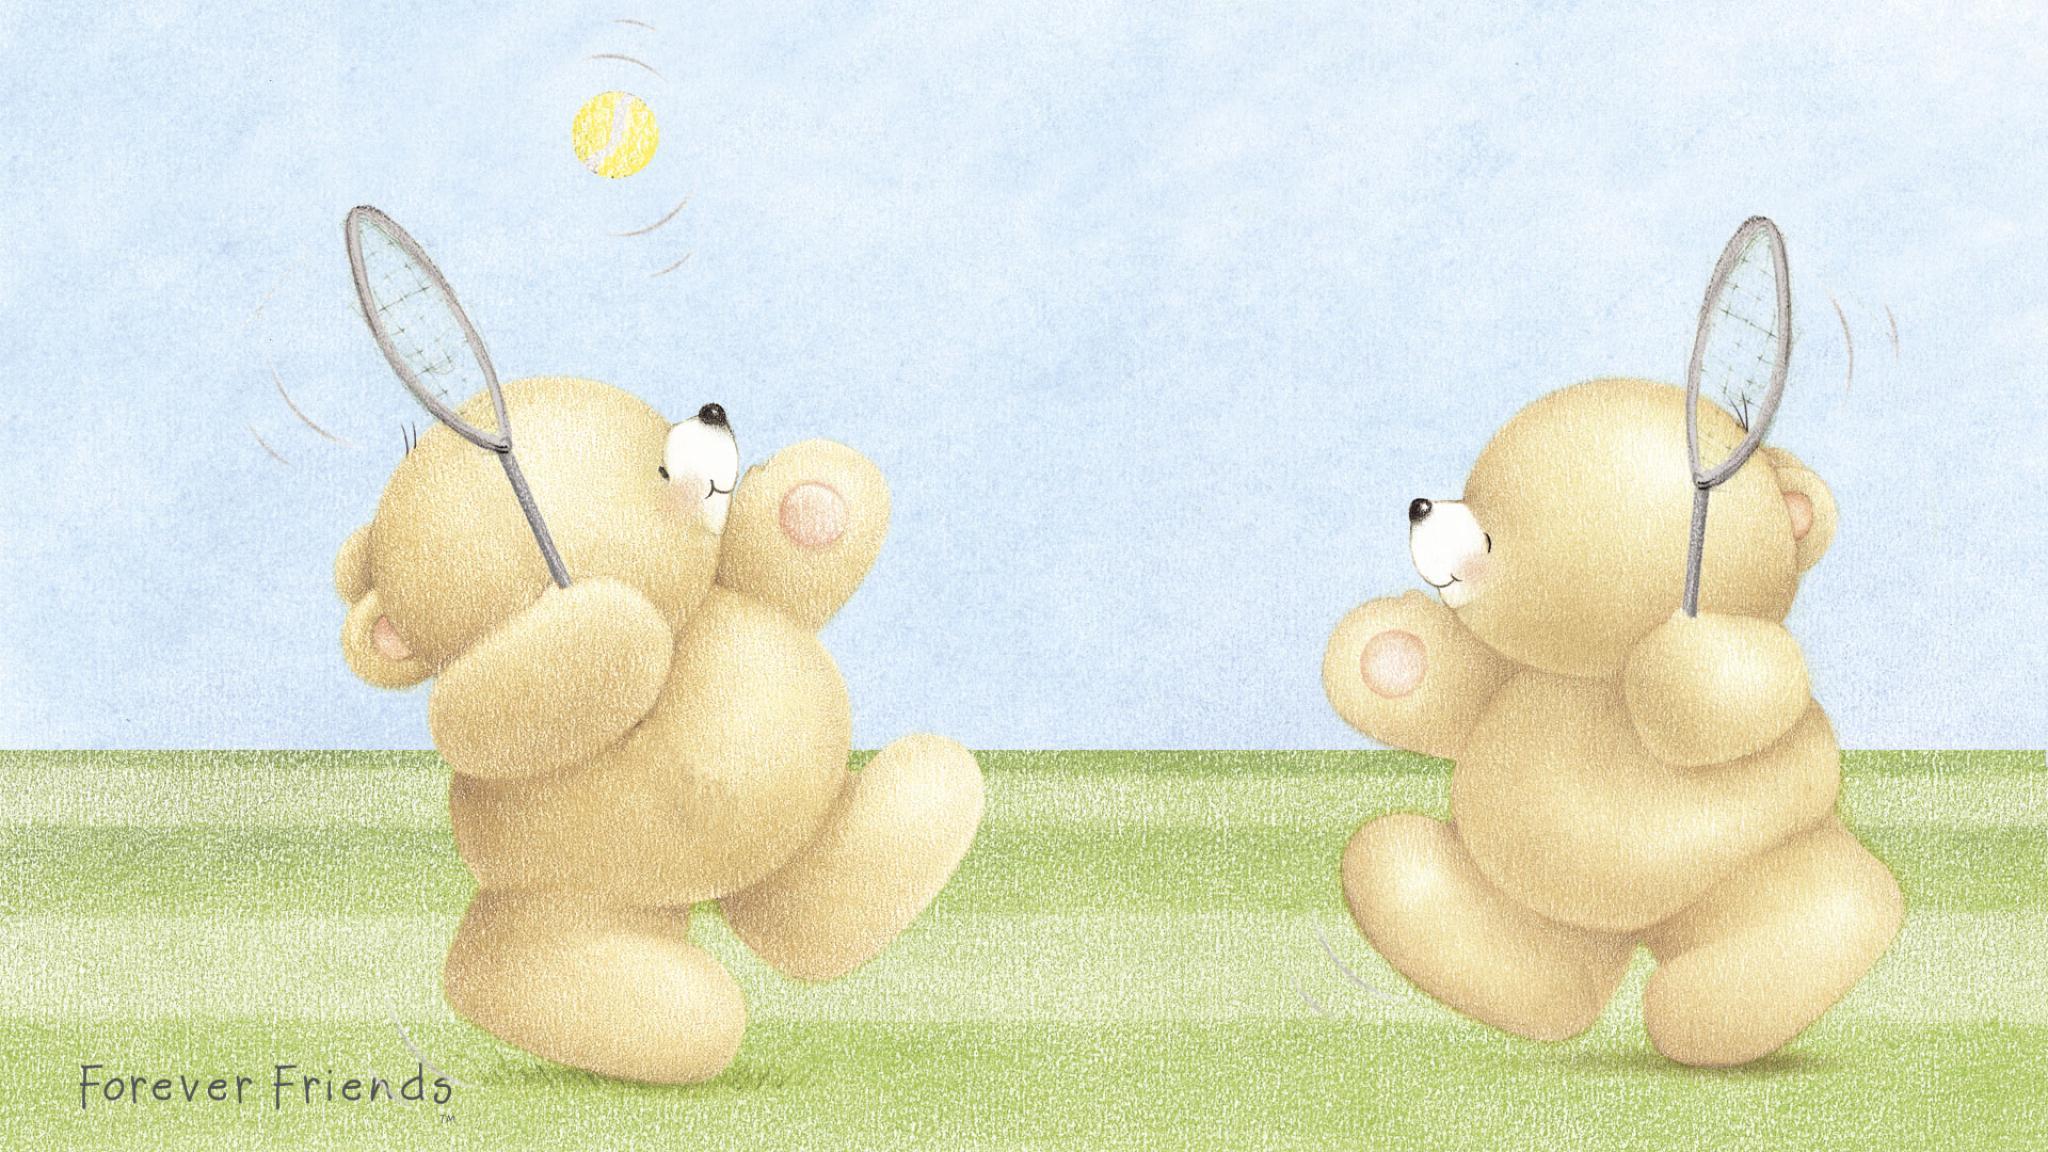 YouLoveIt.ru - Версия для печати - Мишки Forever ...: www.youloveit.ru/nyashka/nyashka_kartinki/print:page,1,10003-mishki...